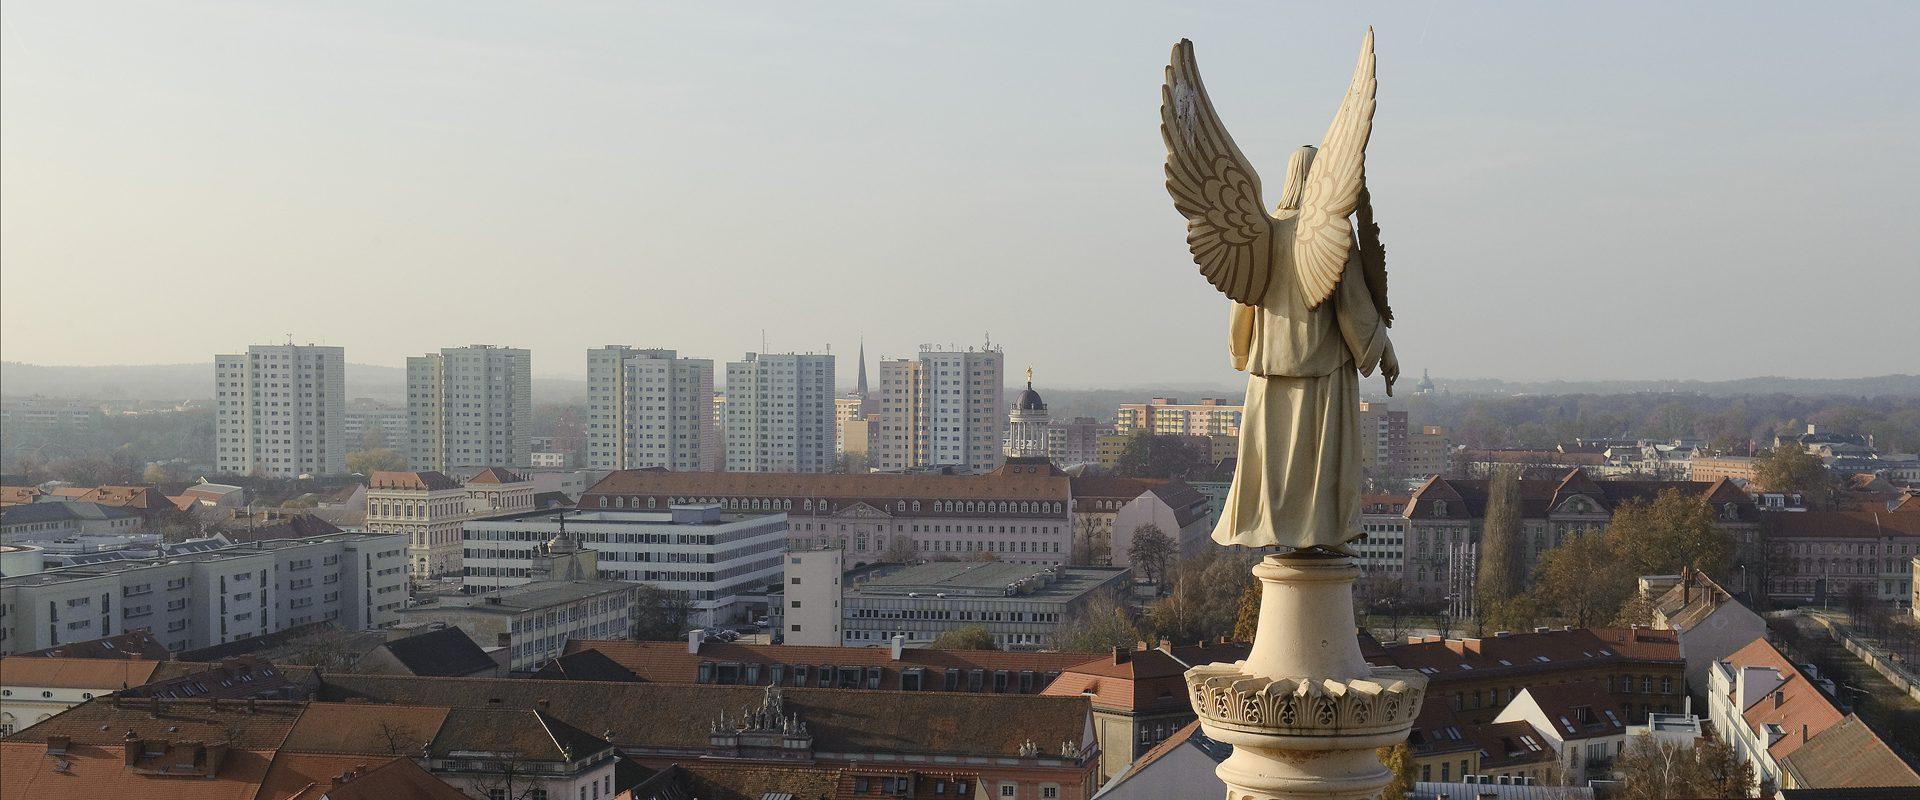 Potsdam, Blick vom Turm der Nikolaikirche. Foto Erik-Jan Ouwerkerk